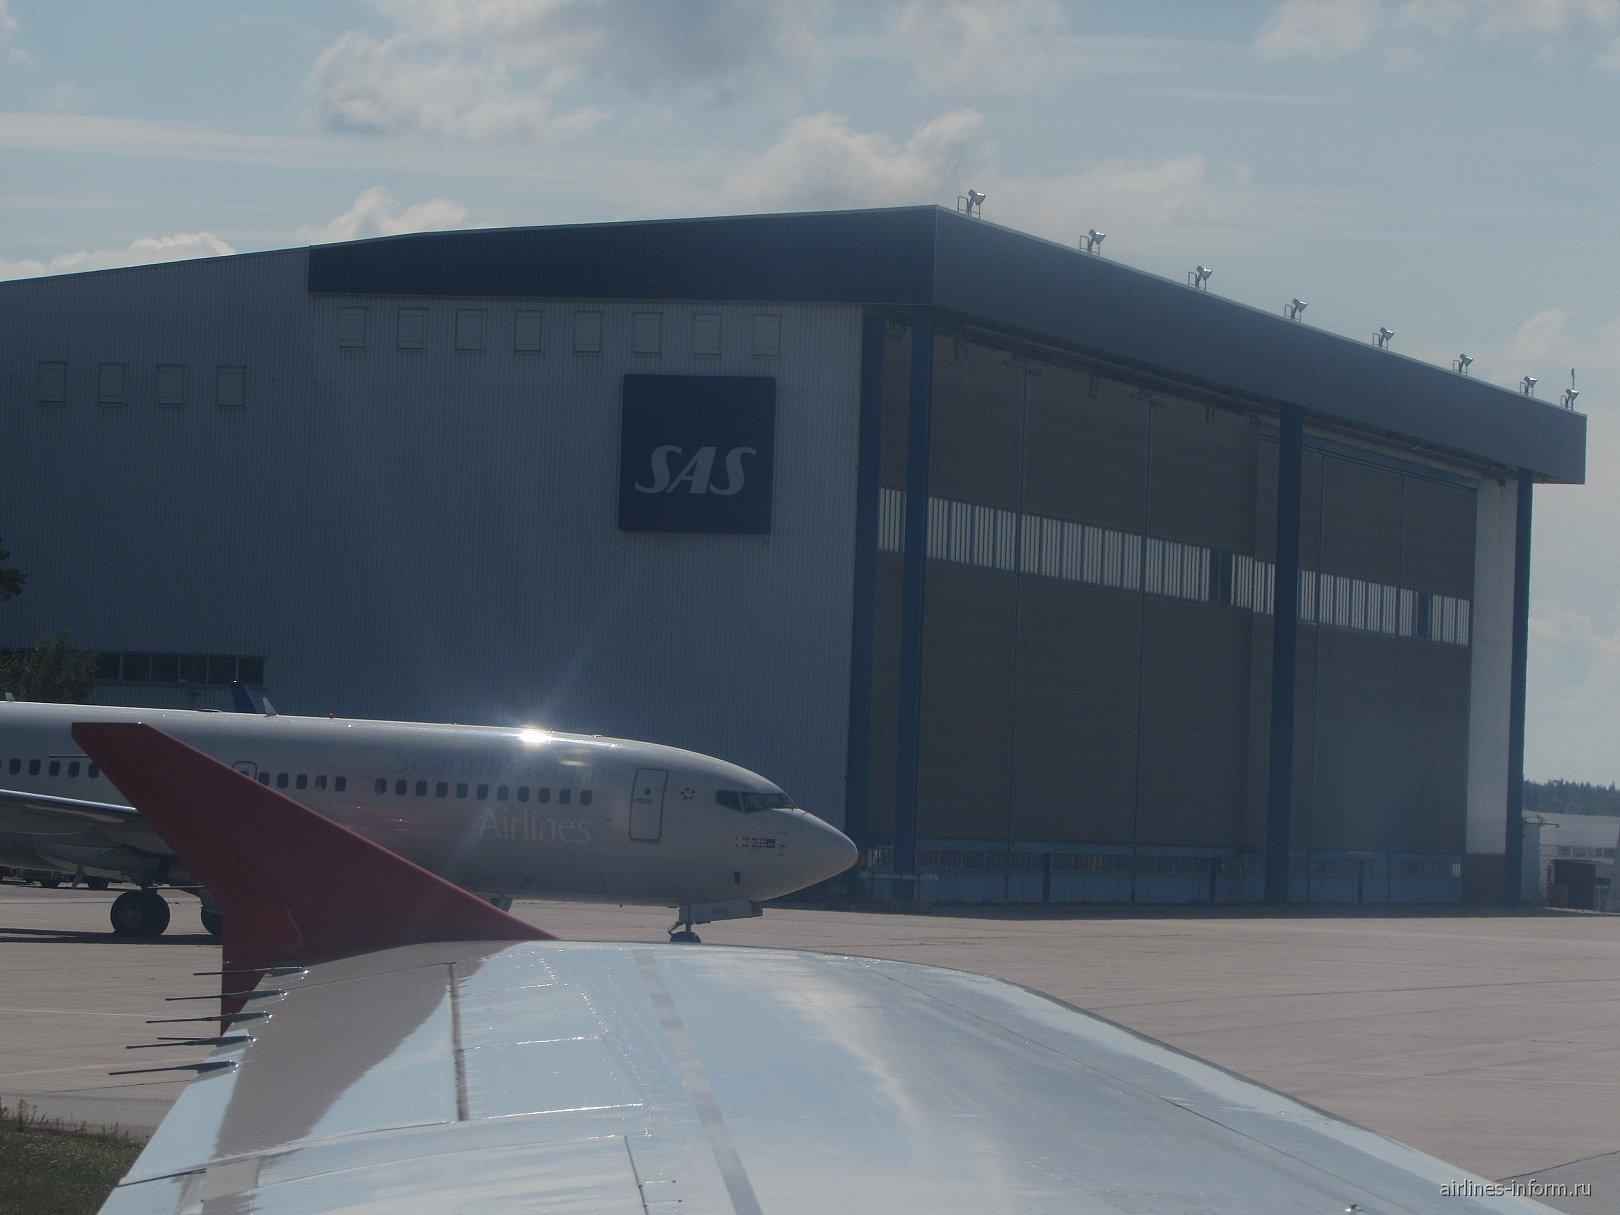 Ангар SAS в аэропорту Арланда